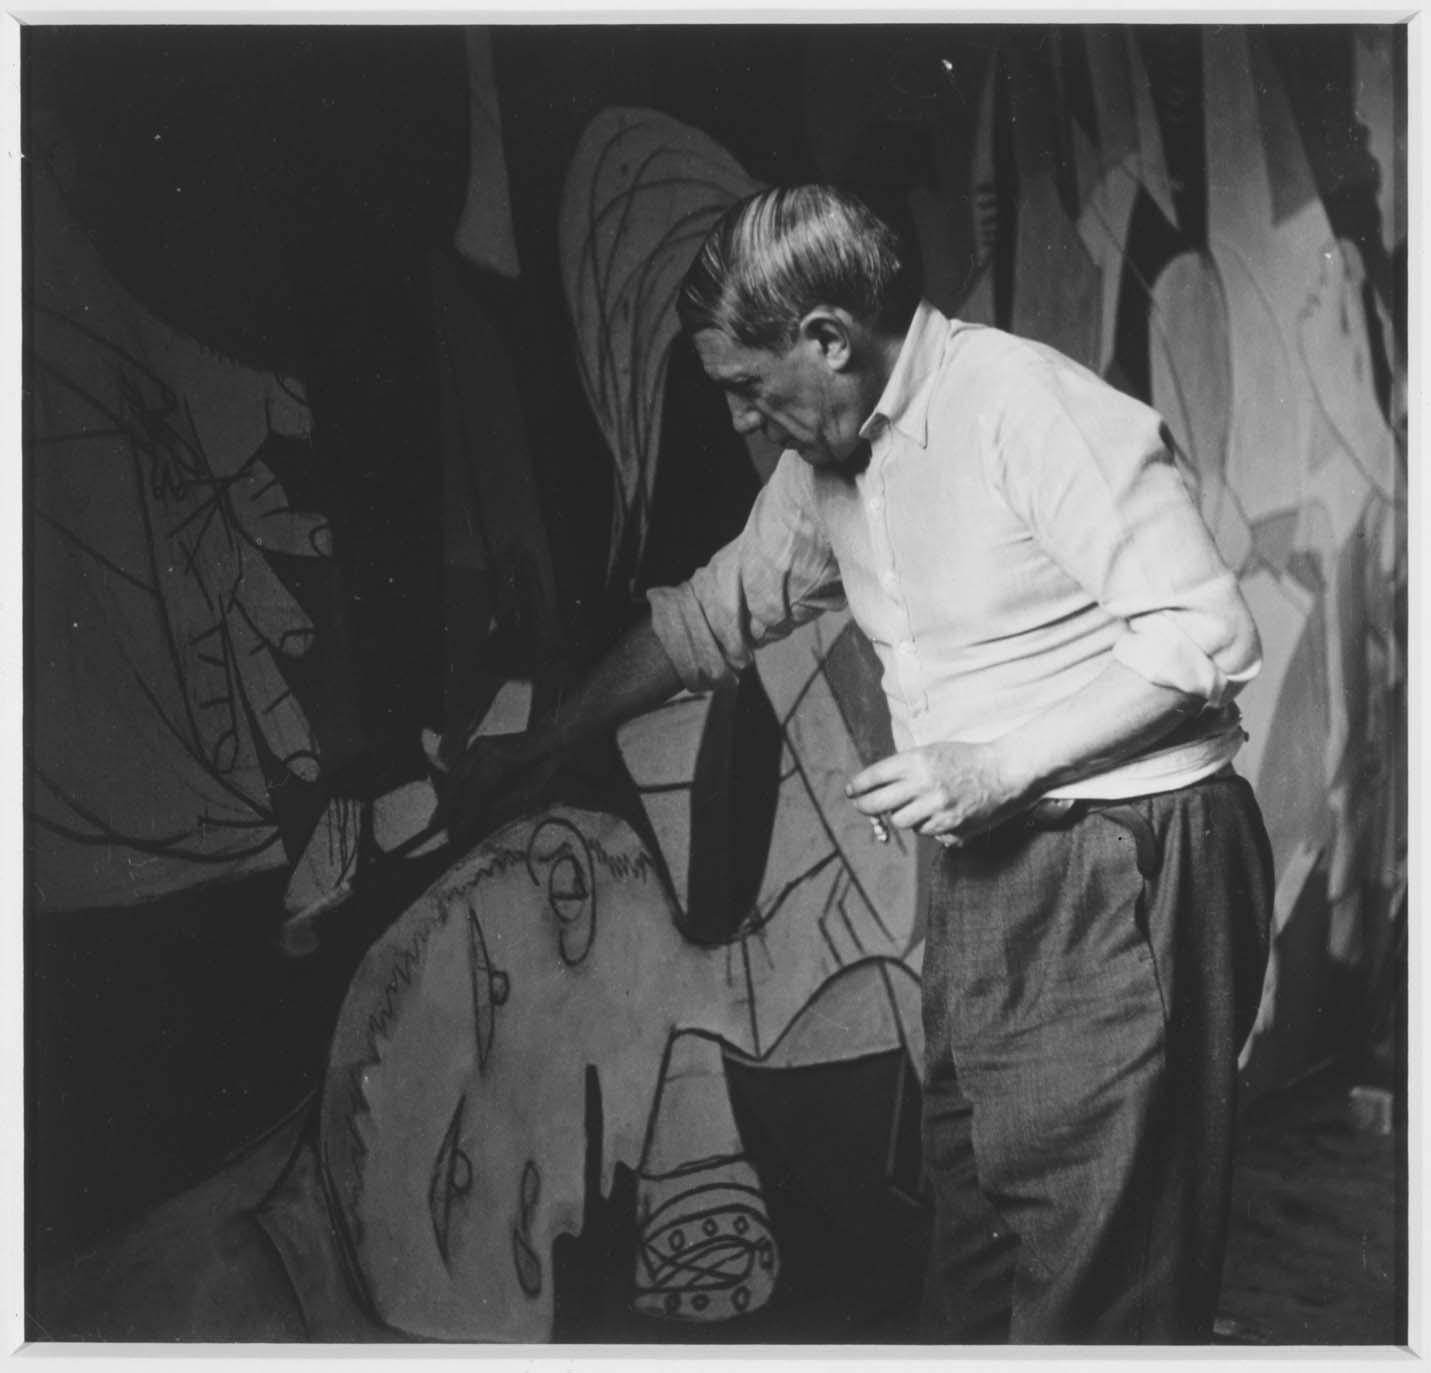 foto pablo picasso pintando guernica dionisio arte